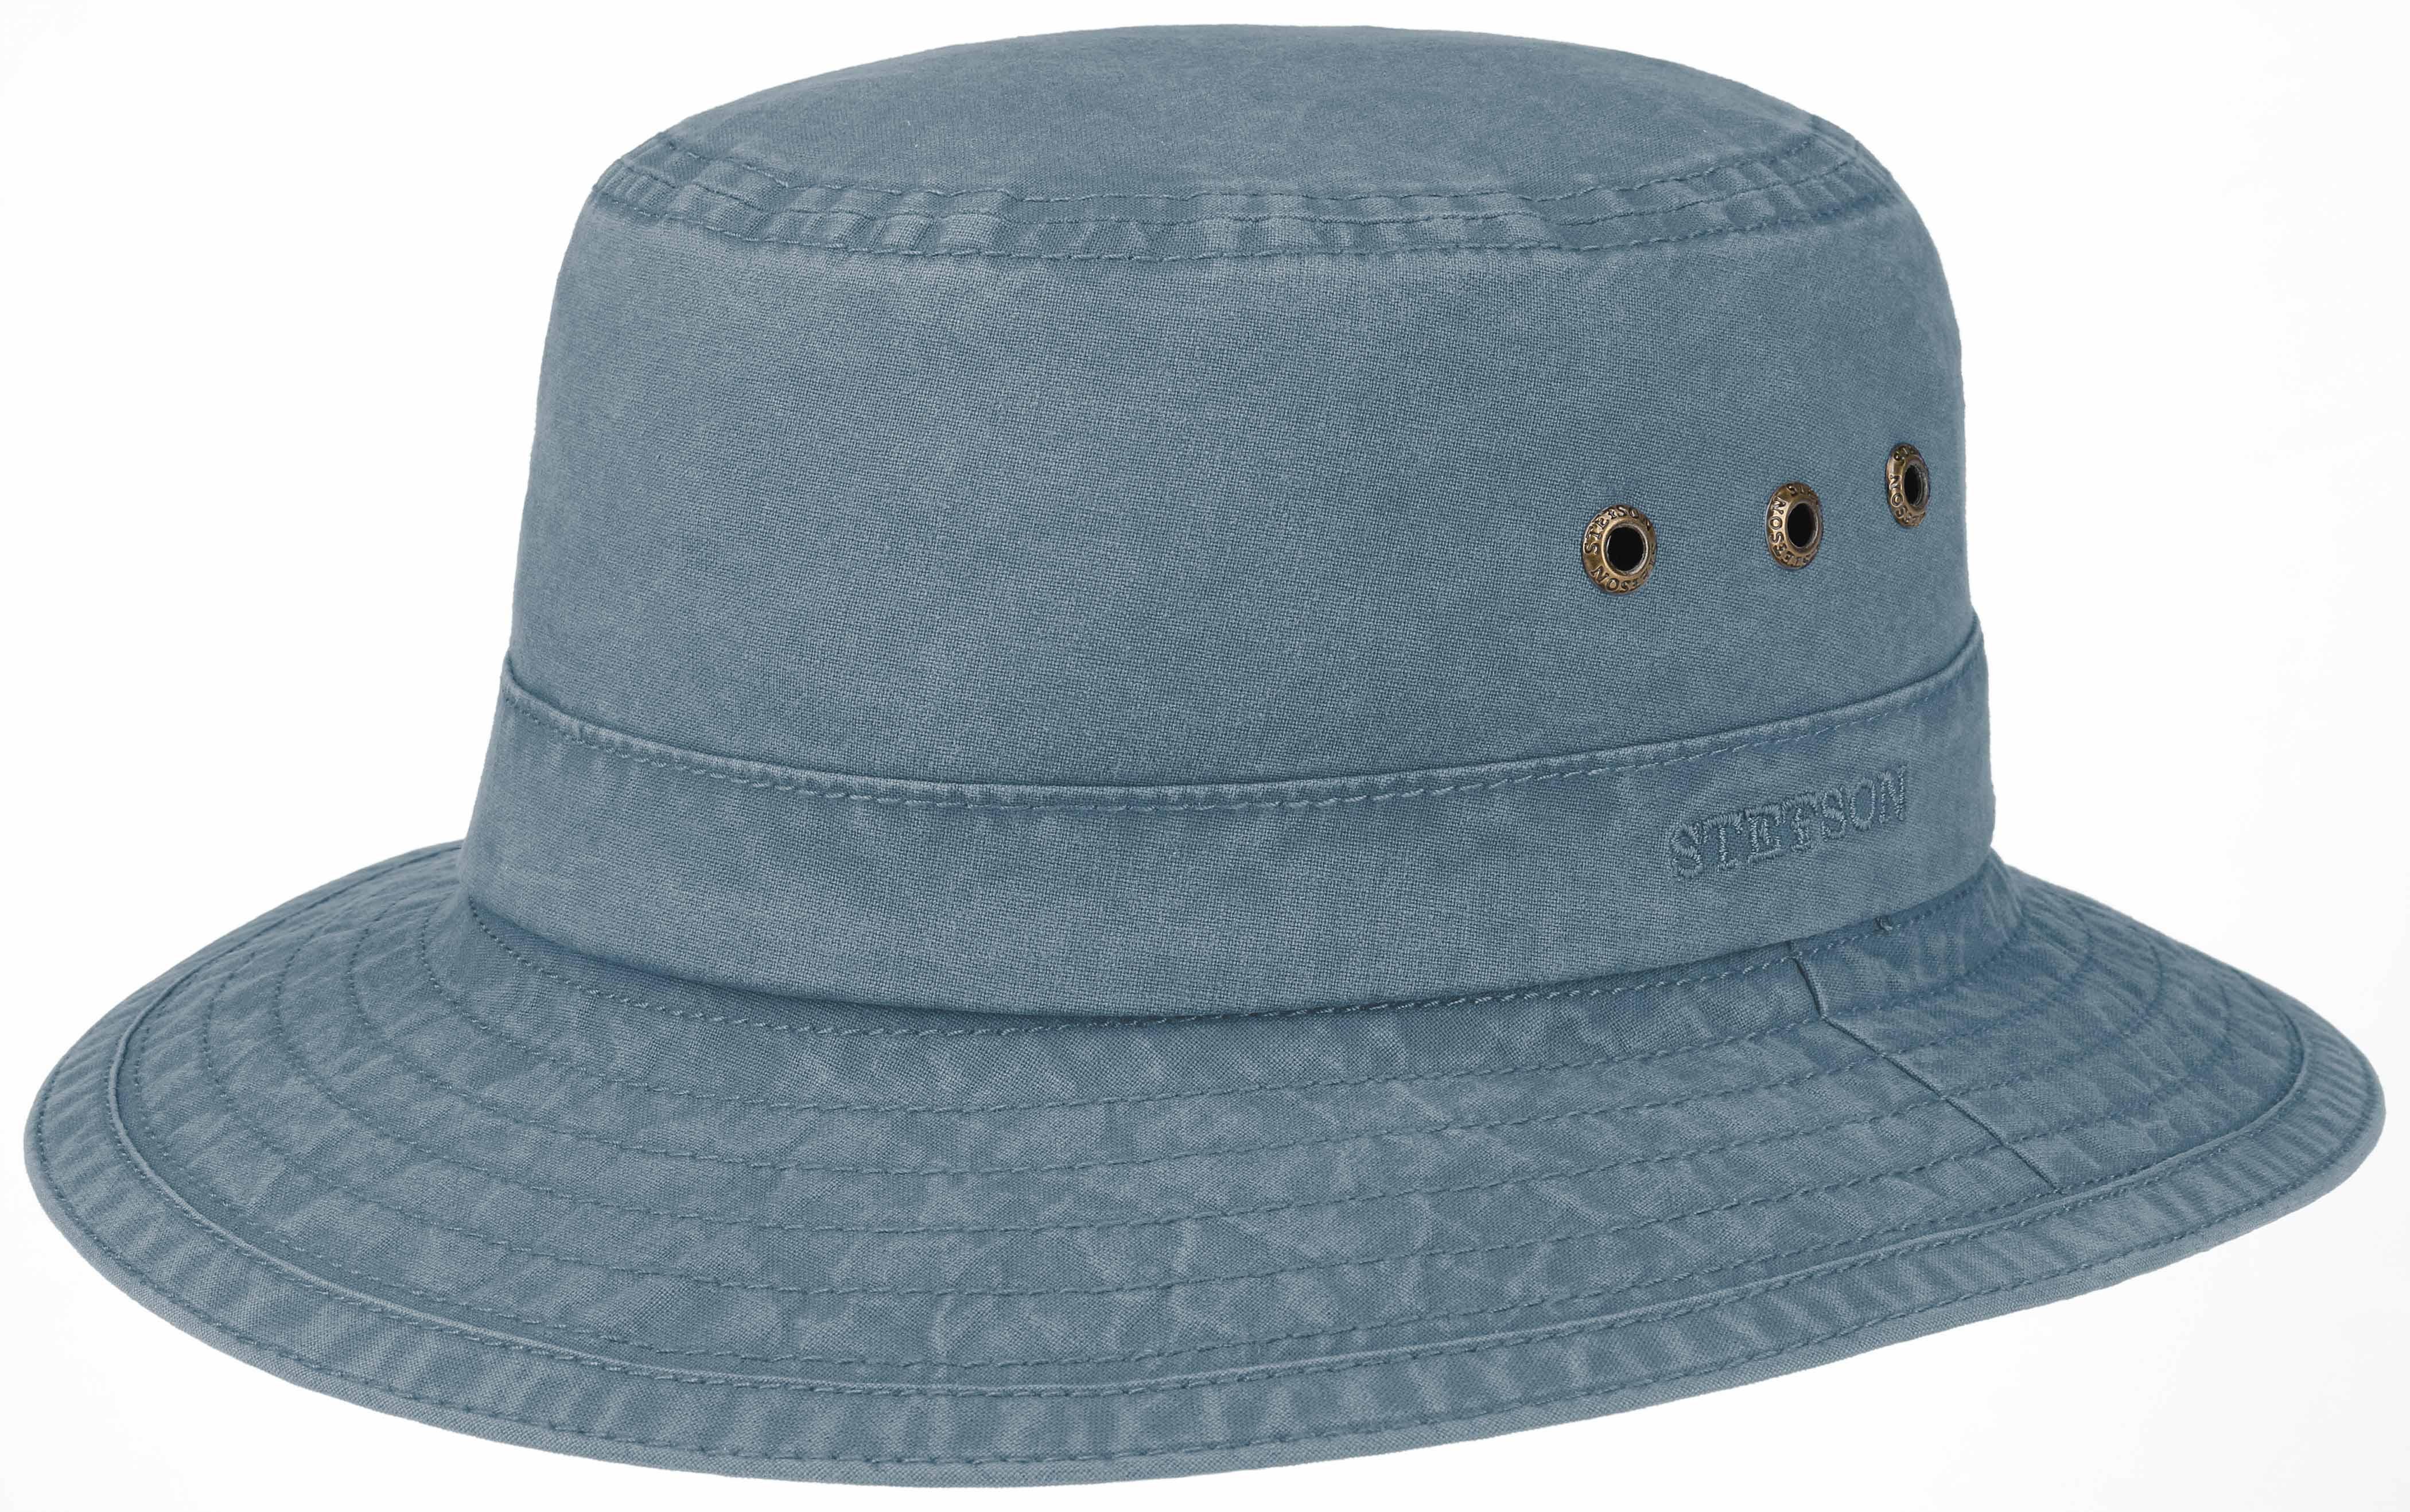 Stetson - Stetson Bucket Delave Organic Cotton Uv Protection Lacivert Şapka